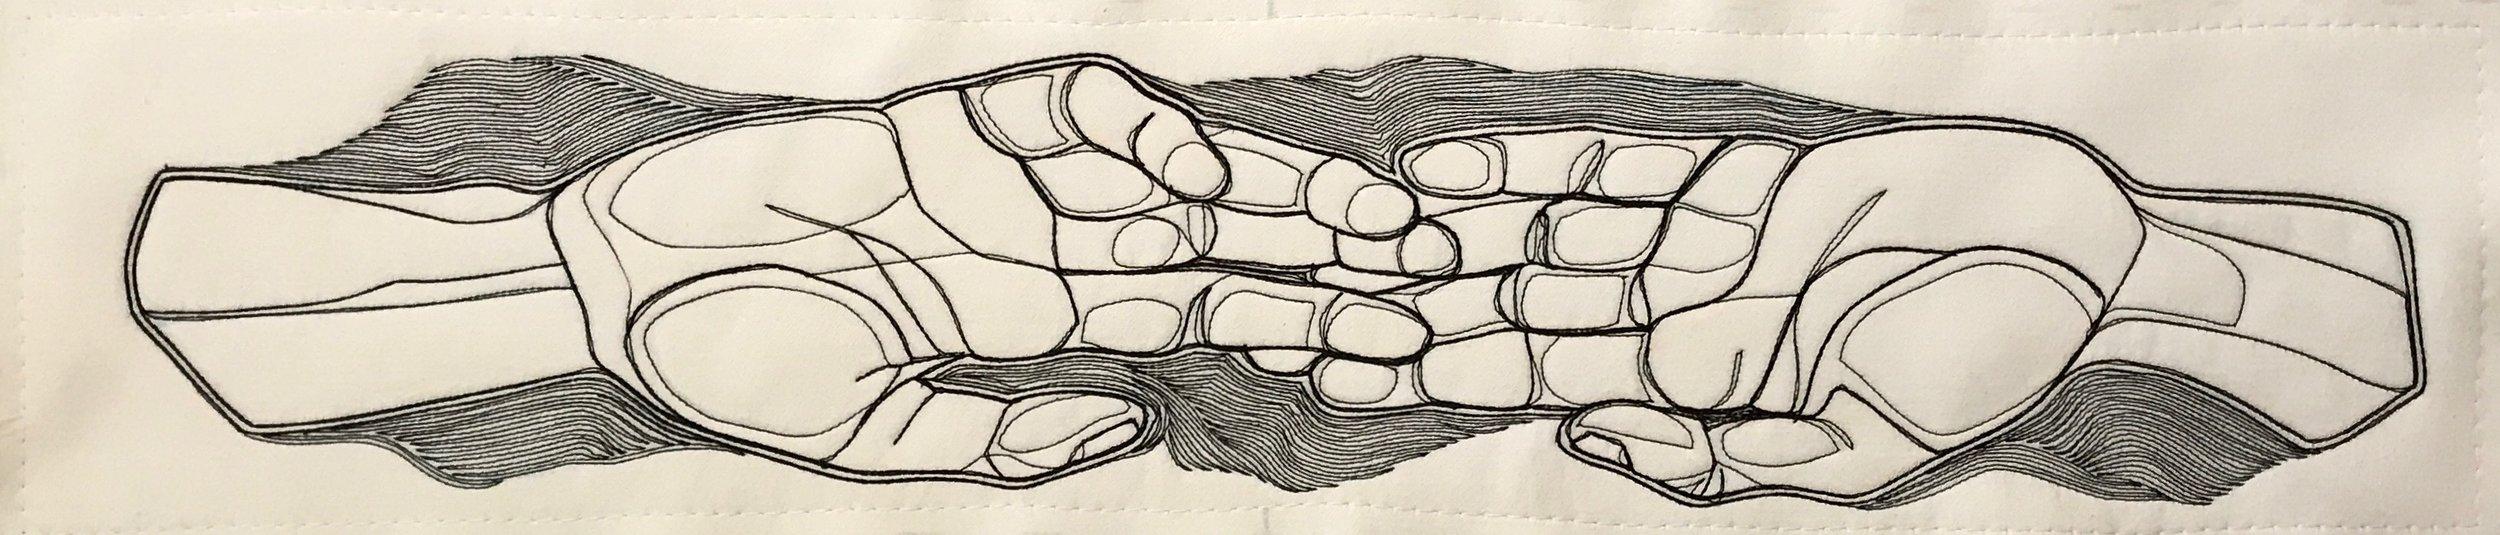 HANDS EMBRACE 2